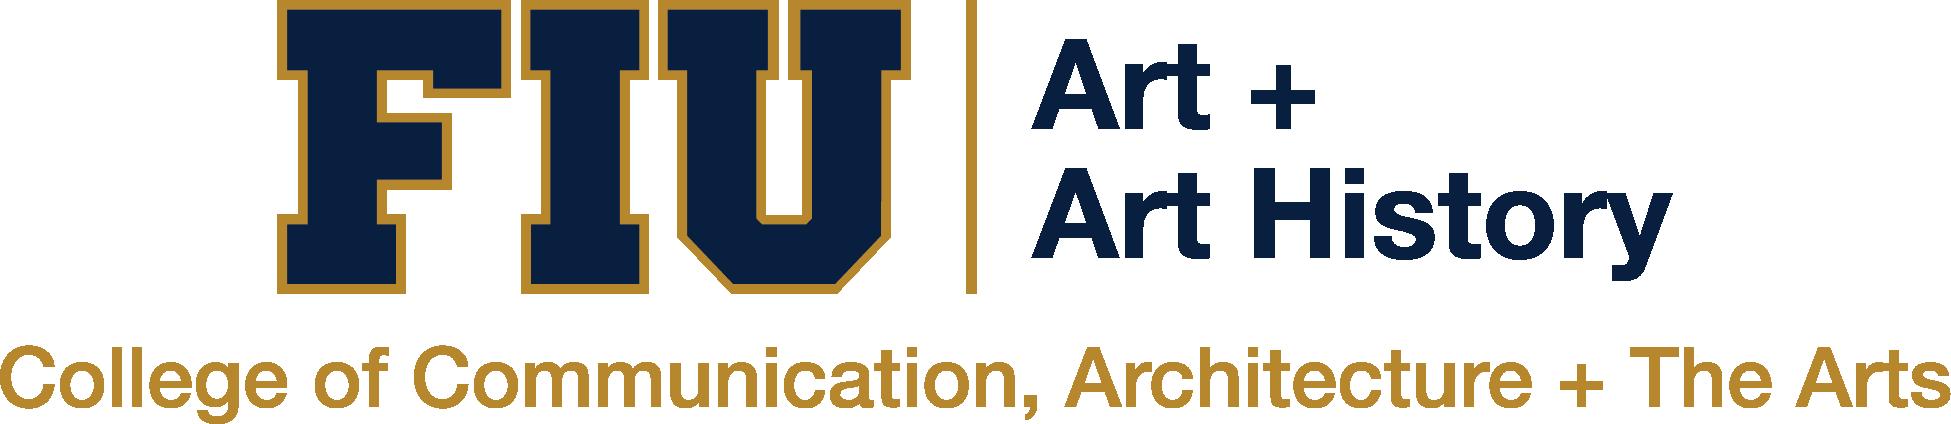 Department of Art + Art History Logo